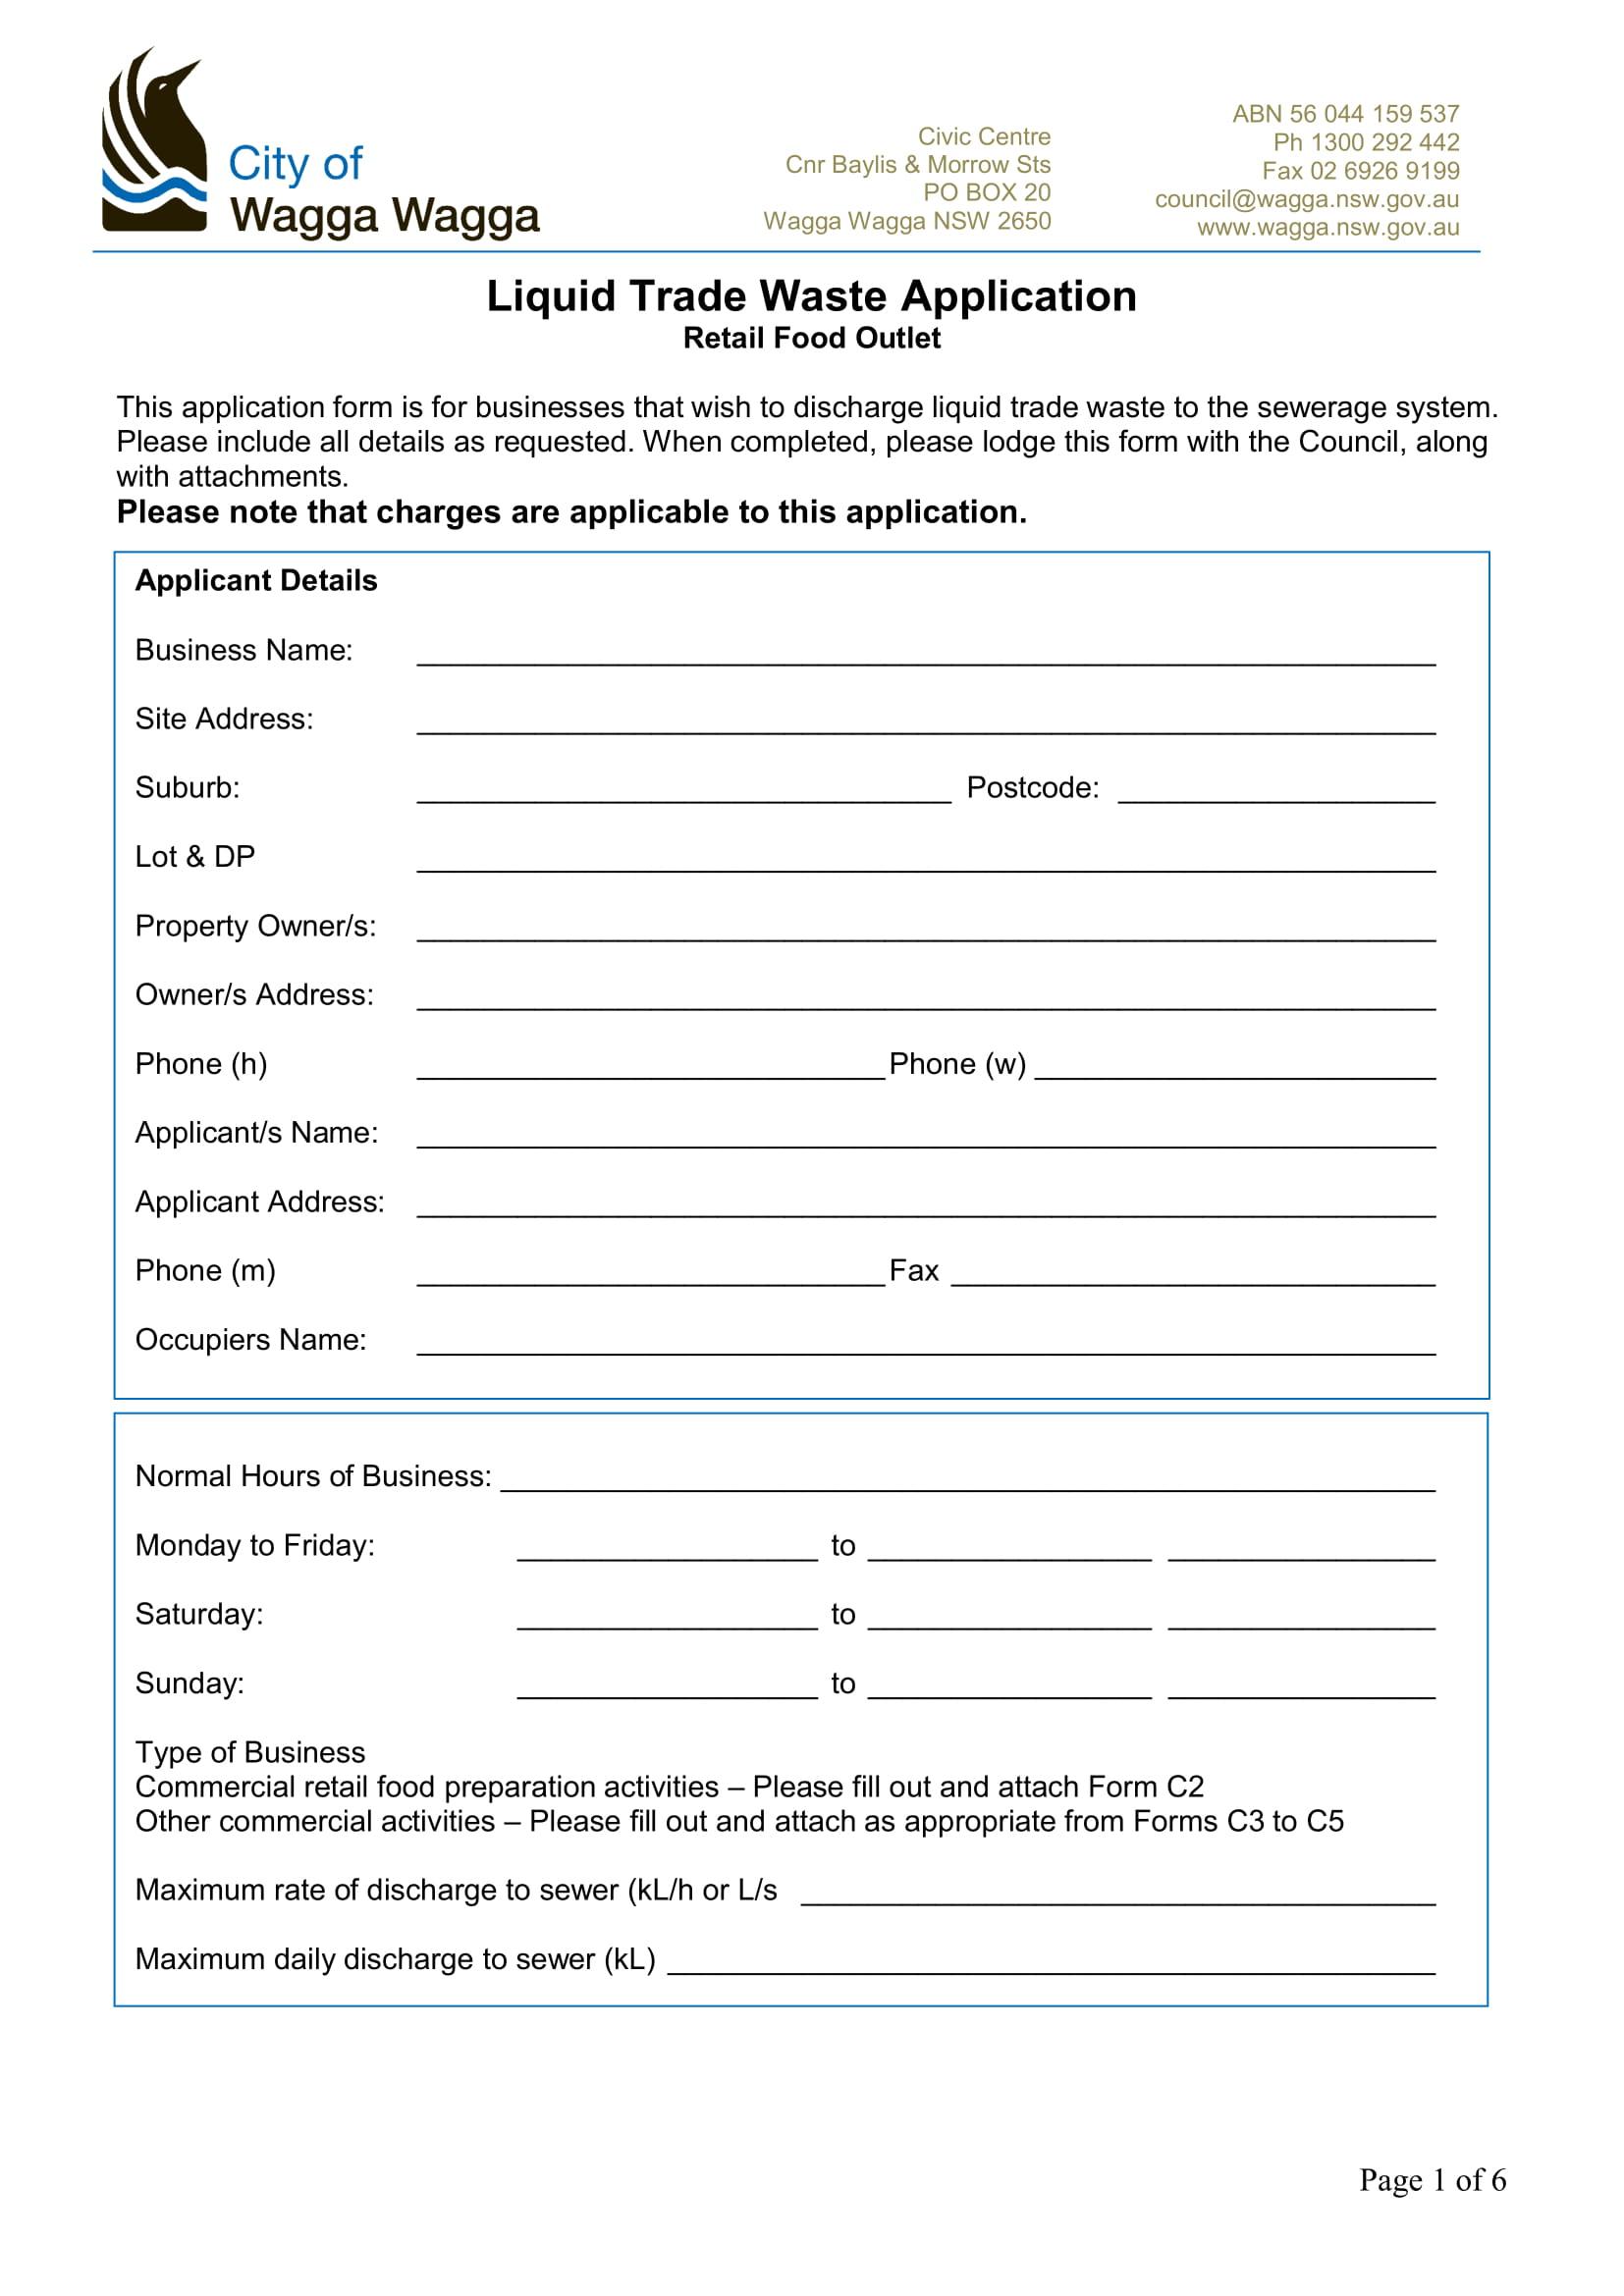 restaurant trade waste application form 1